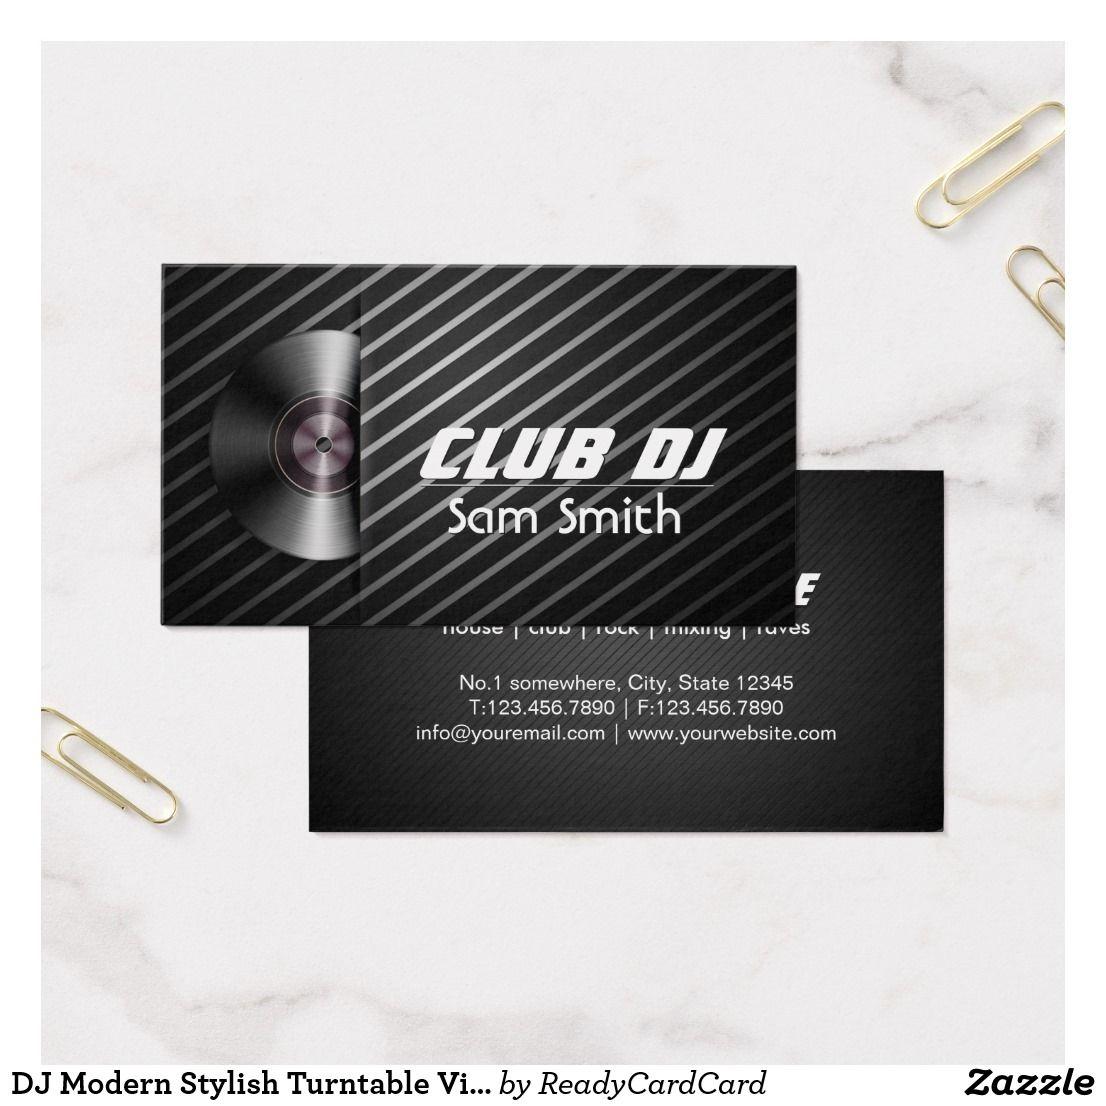 DJ Modern Stylish Turntable Vinyl Recoder Mixer Business Card | DJ ...